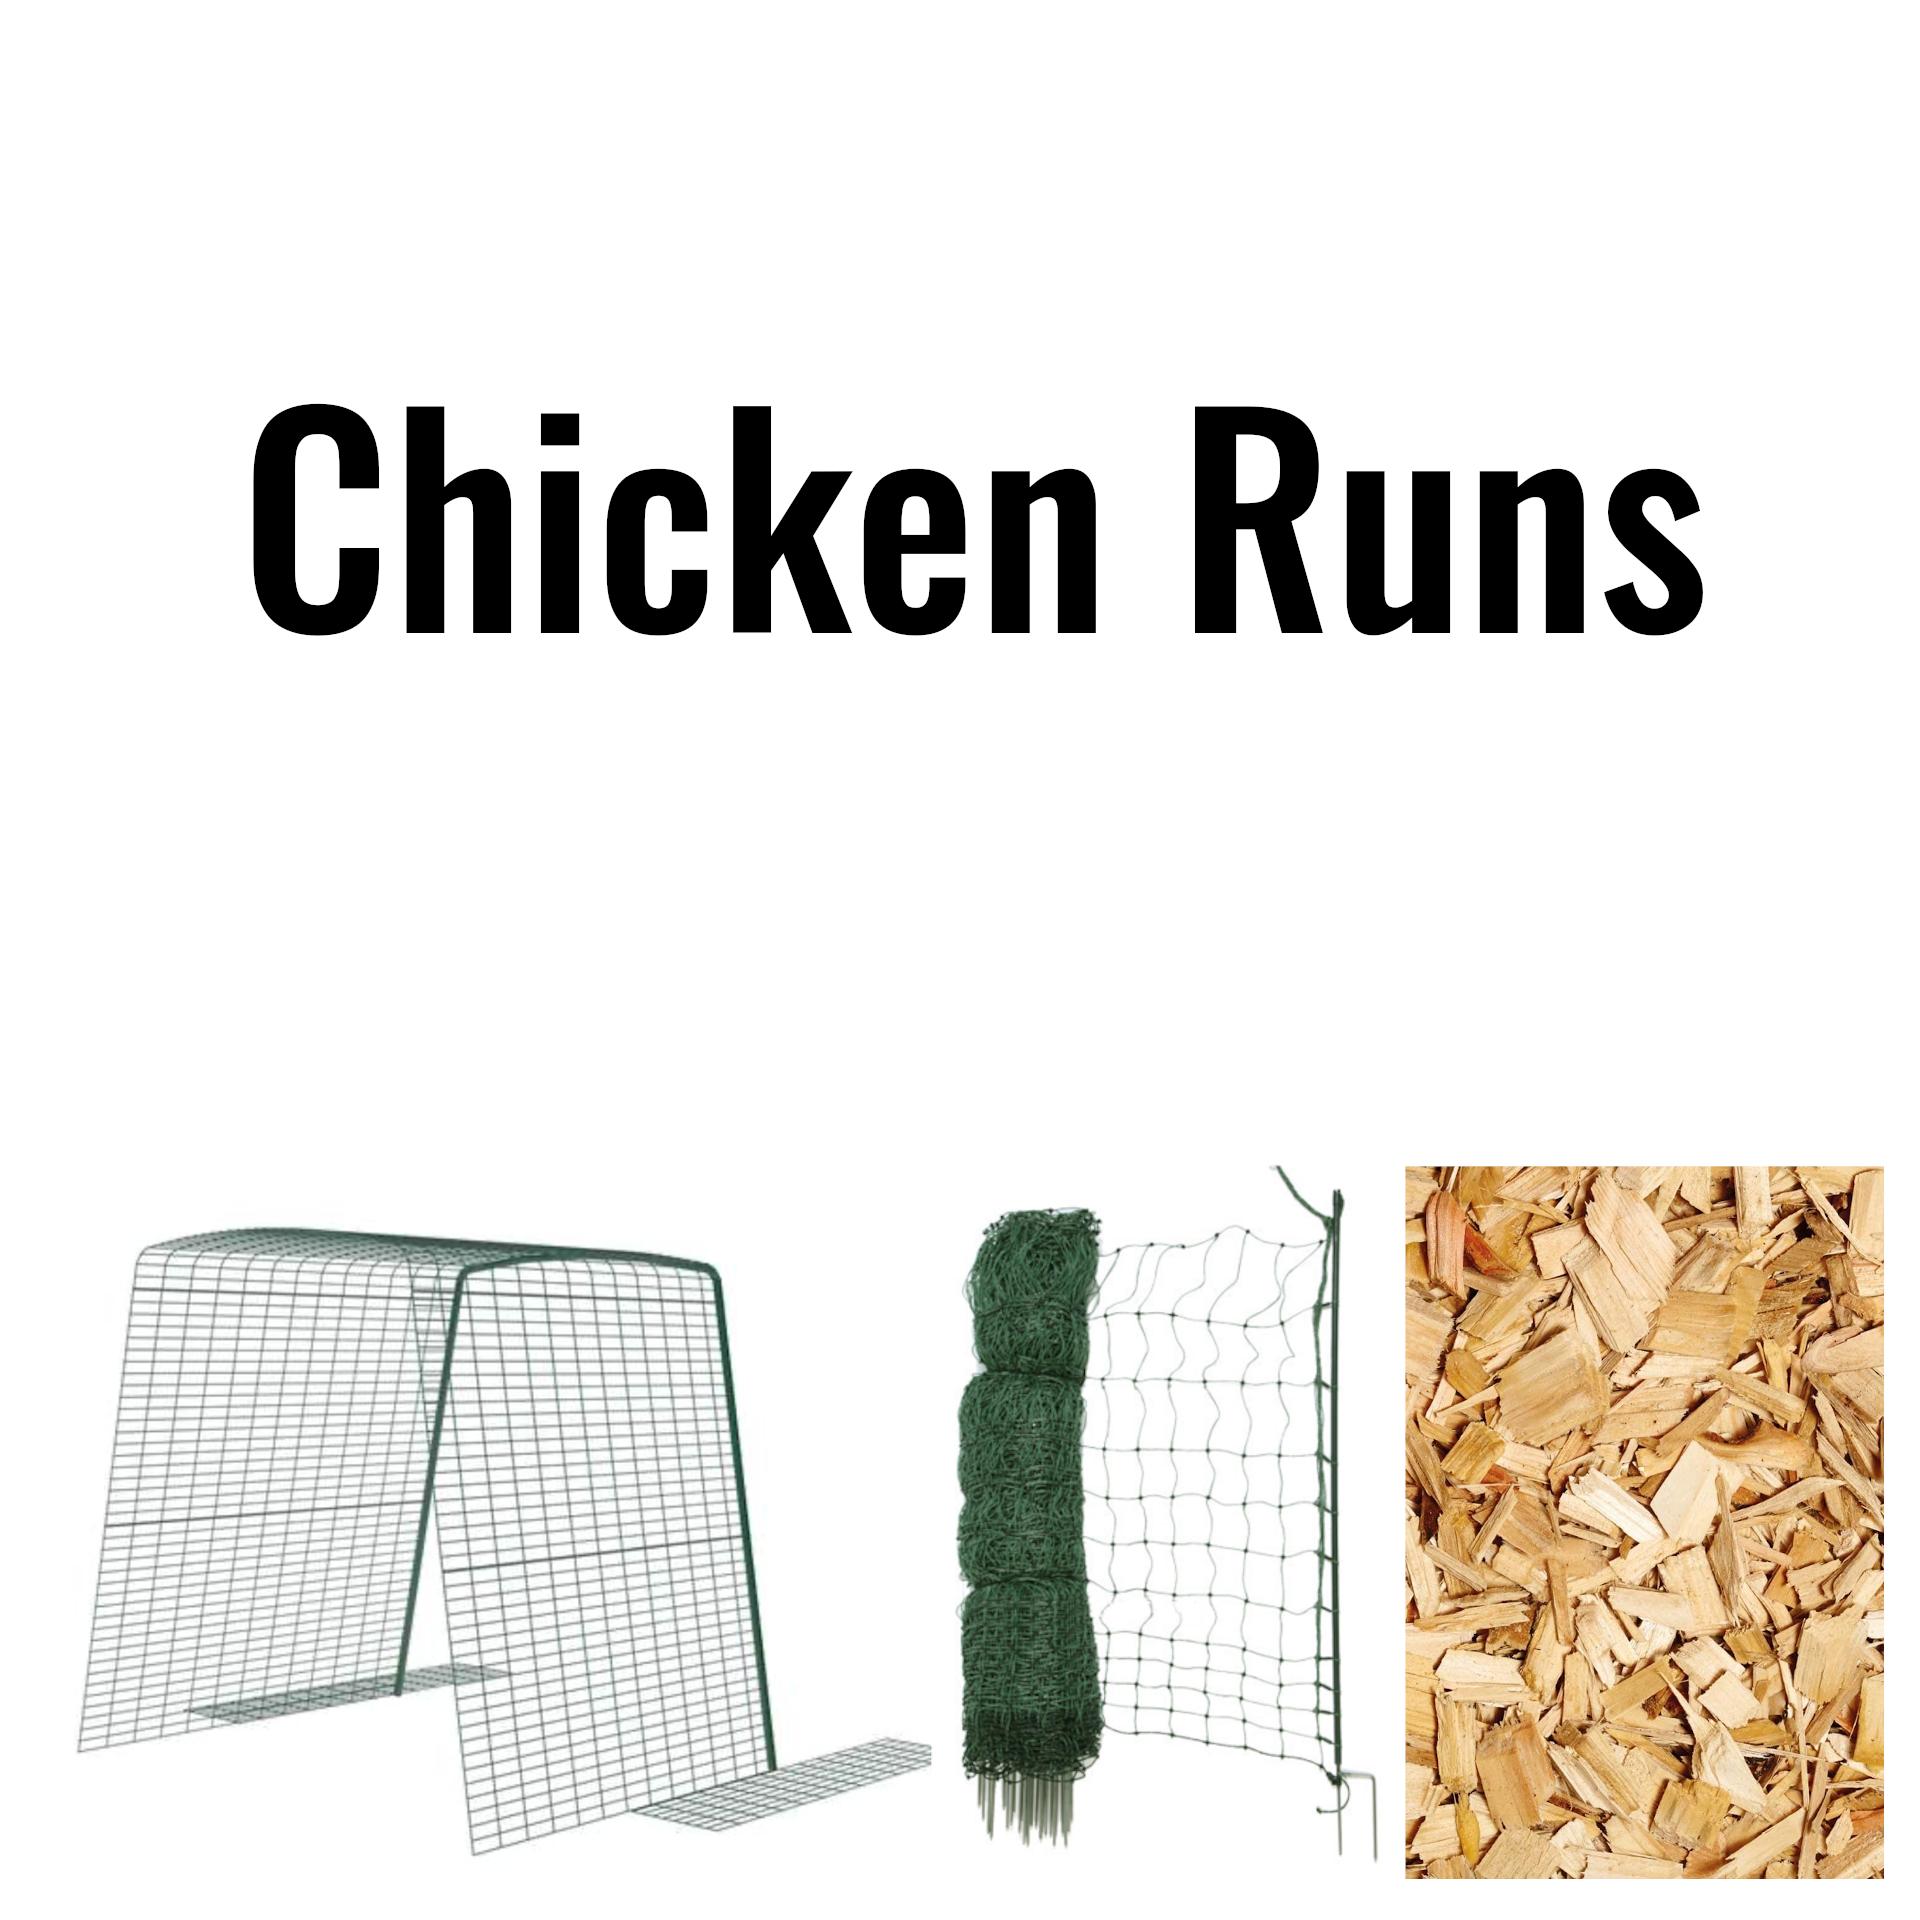 Chick runs